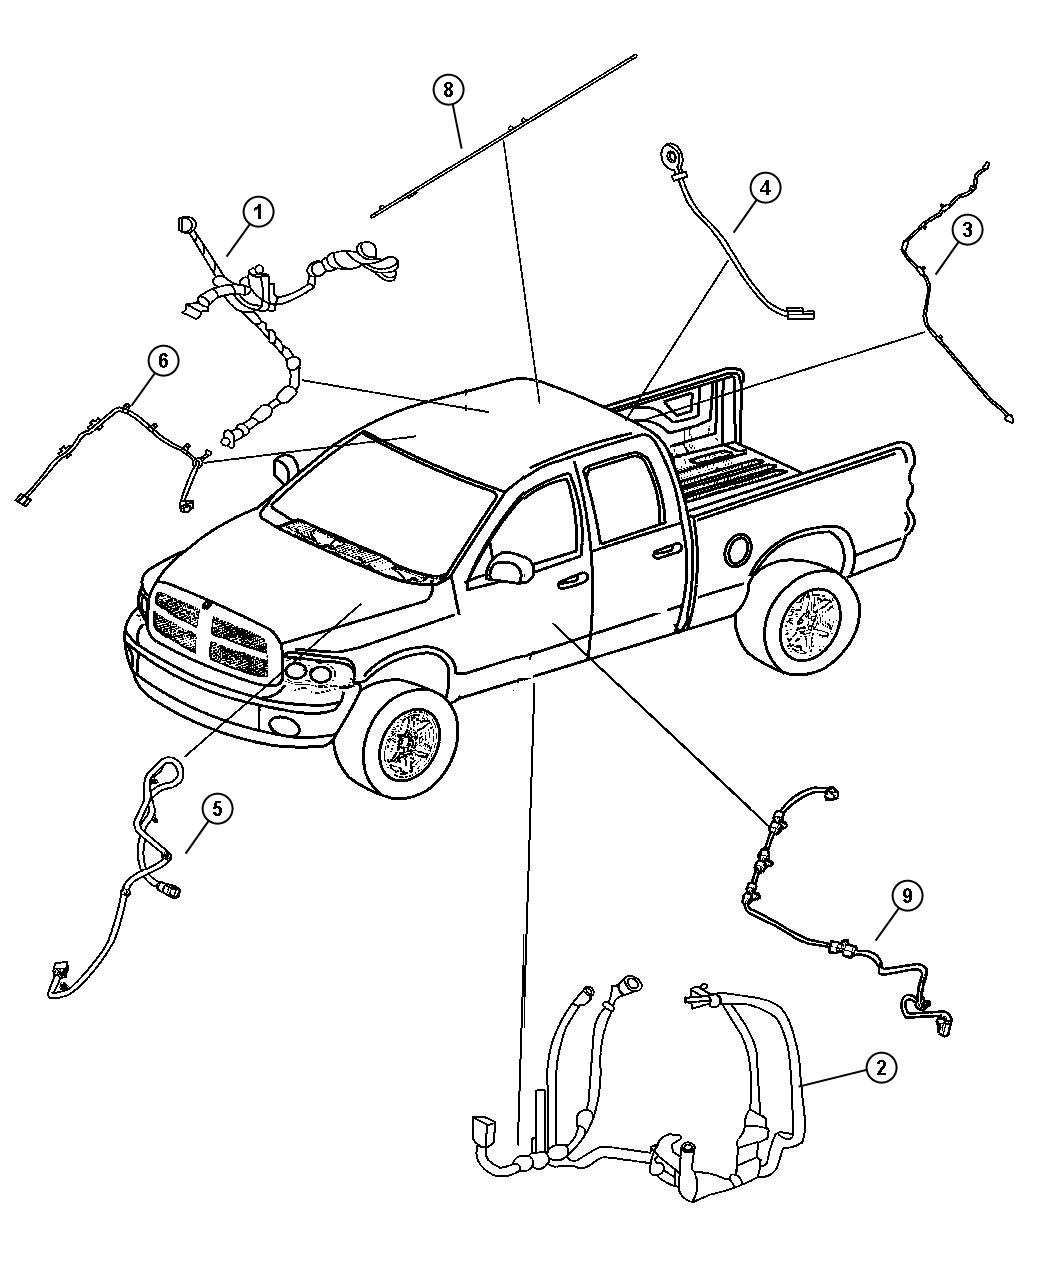 Dodge Ram 3500 Wiring. Body. [supplemental side air bags